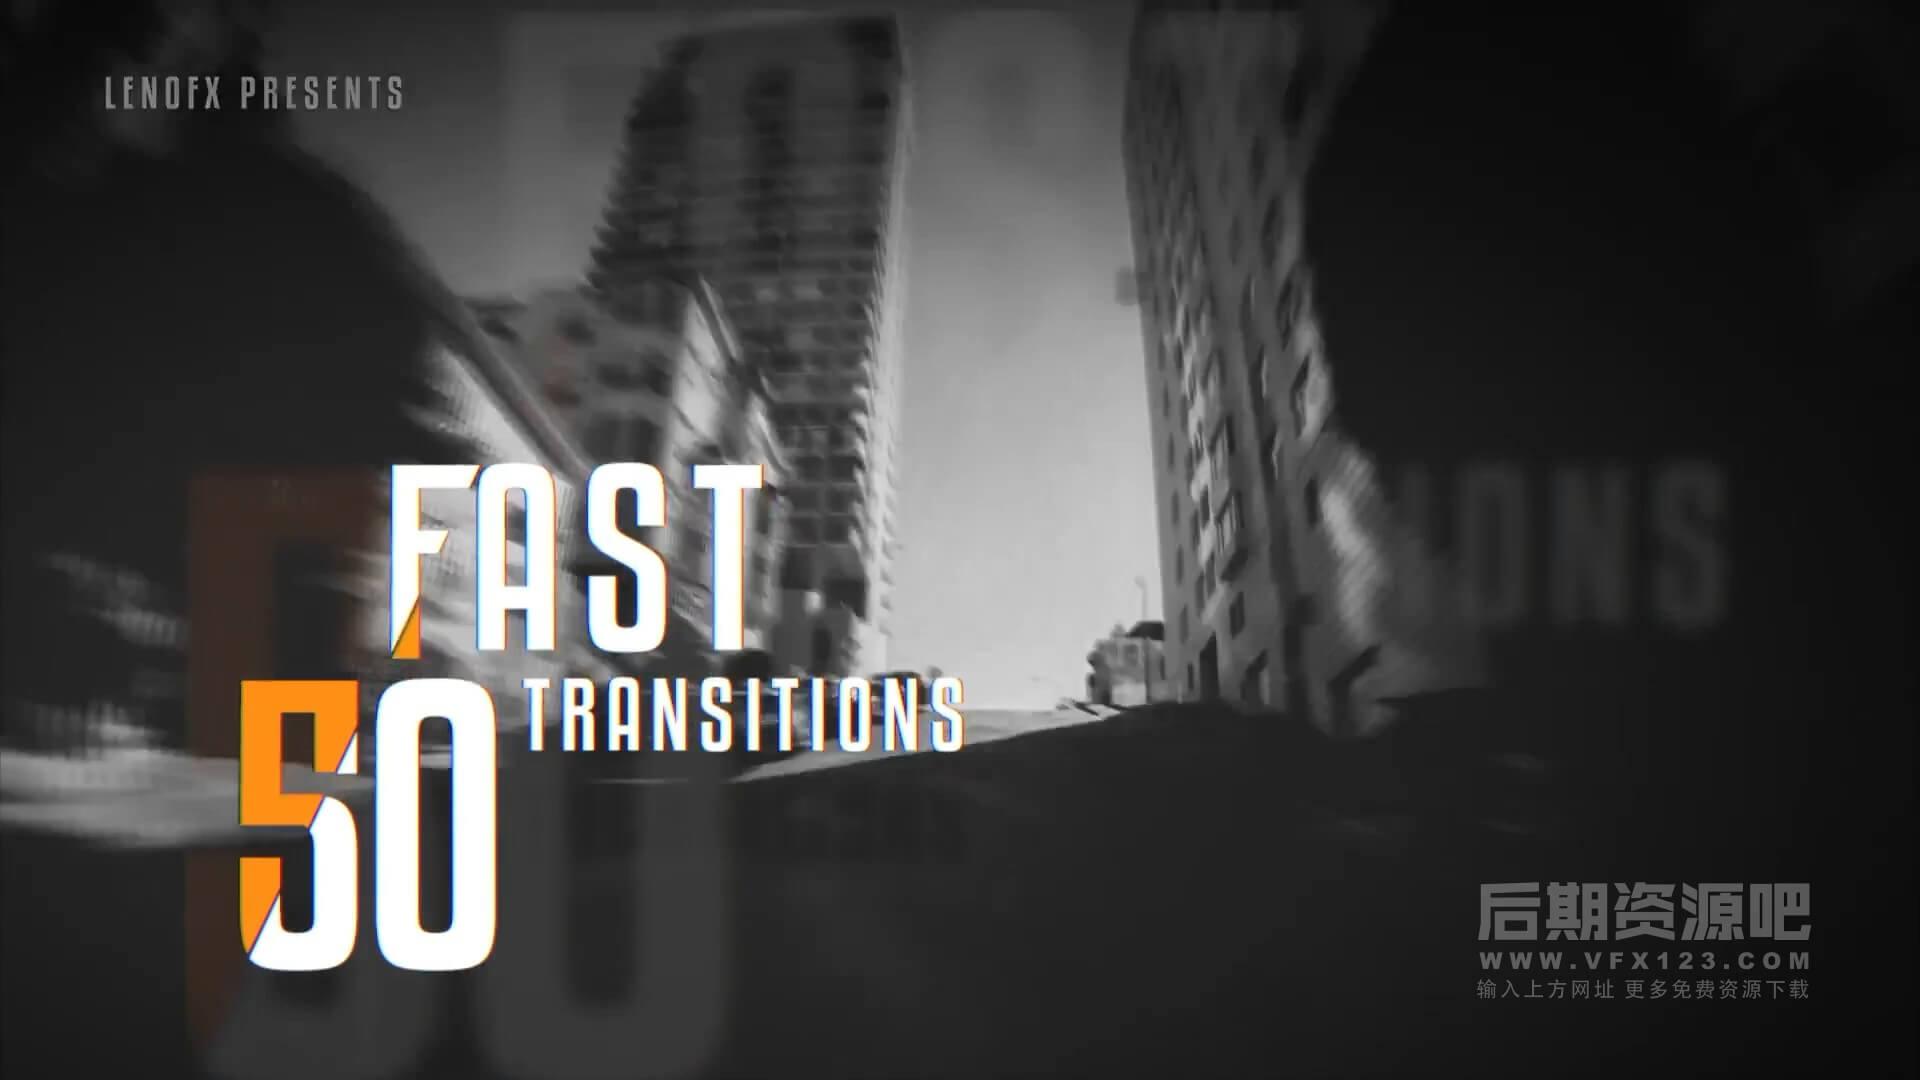 fcpx转场插件 50种快速移动旋转缩放模糊转场 Fast Transitions